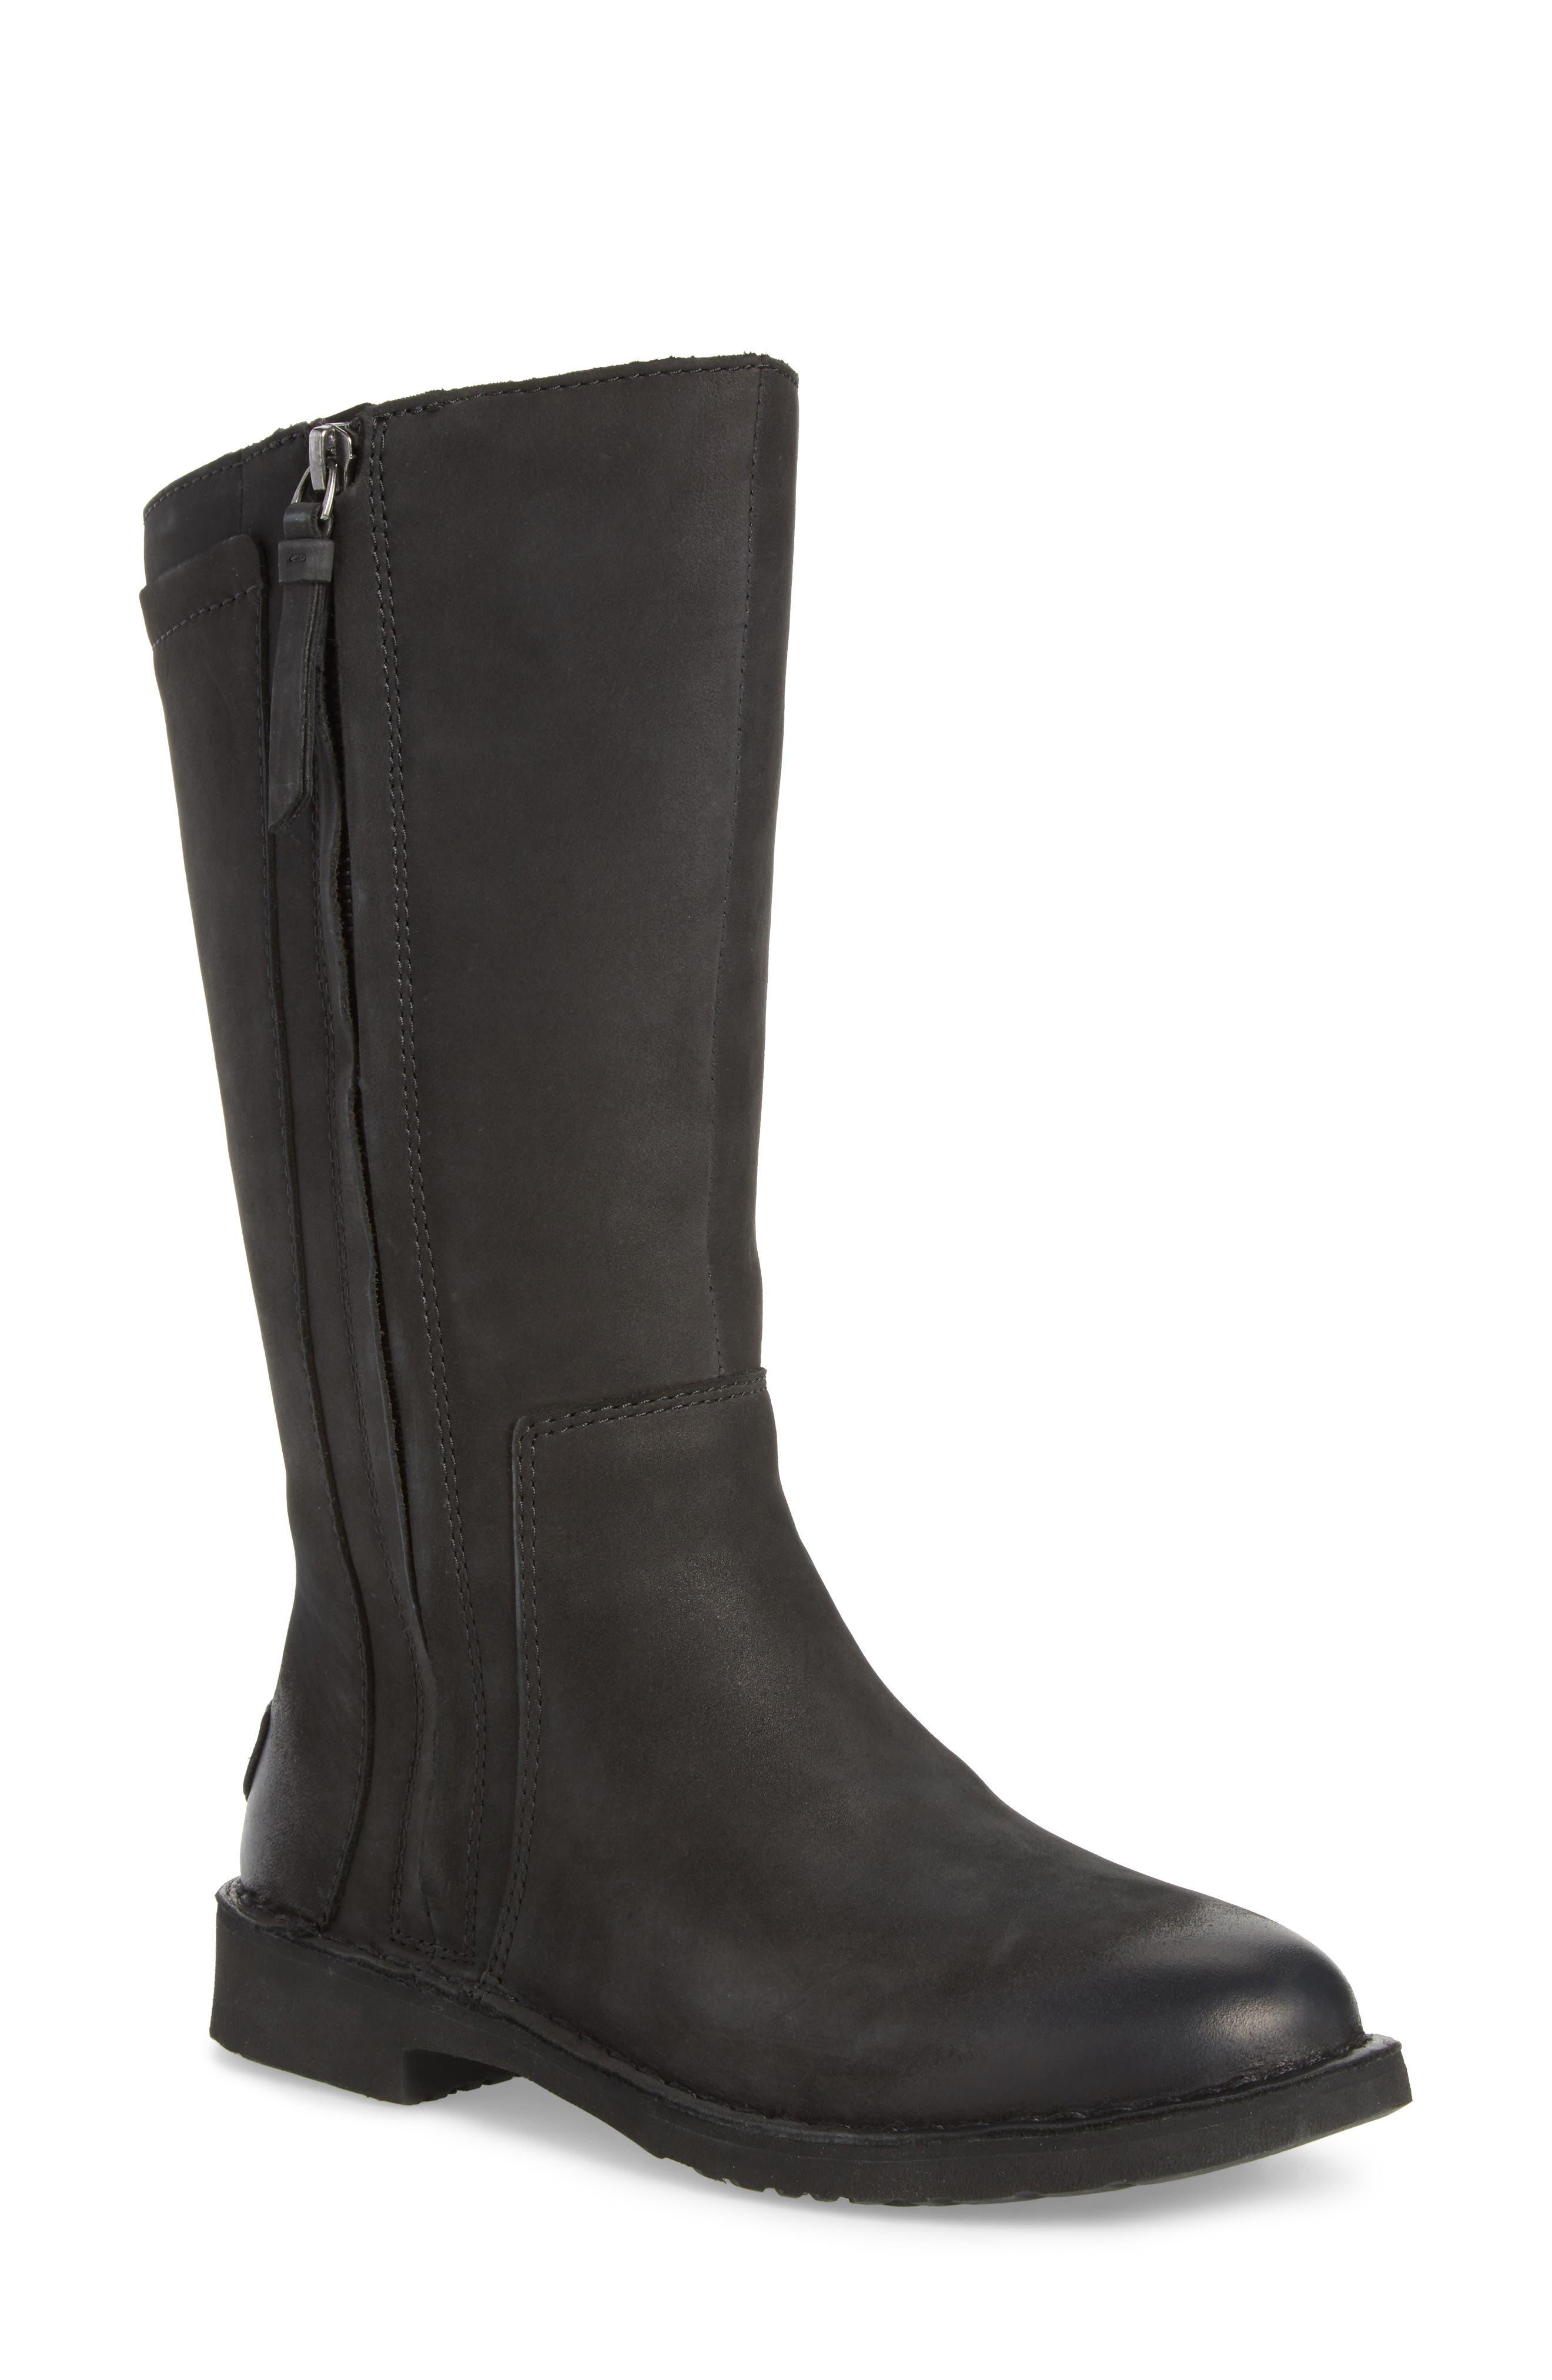 Alternate Image 1 Selected - UGG® Elly Boot (Women)